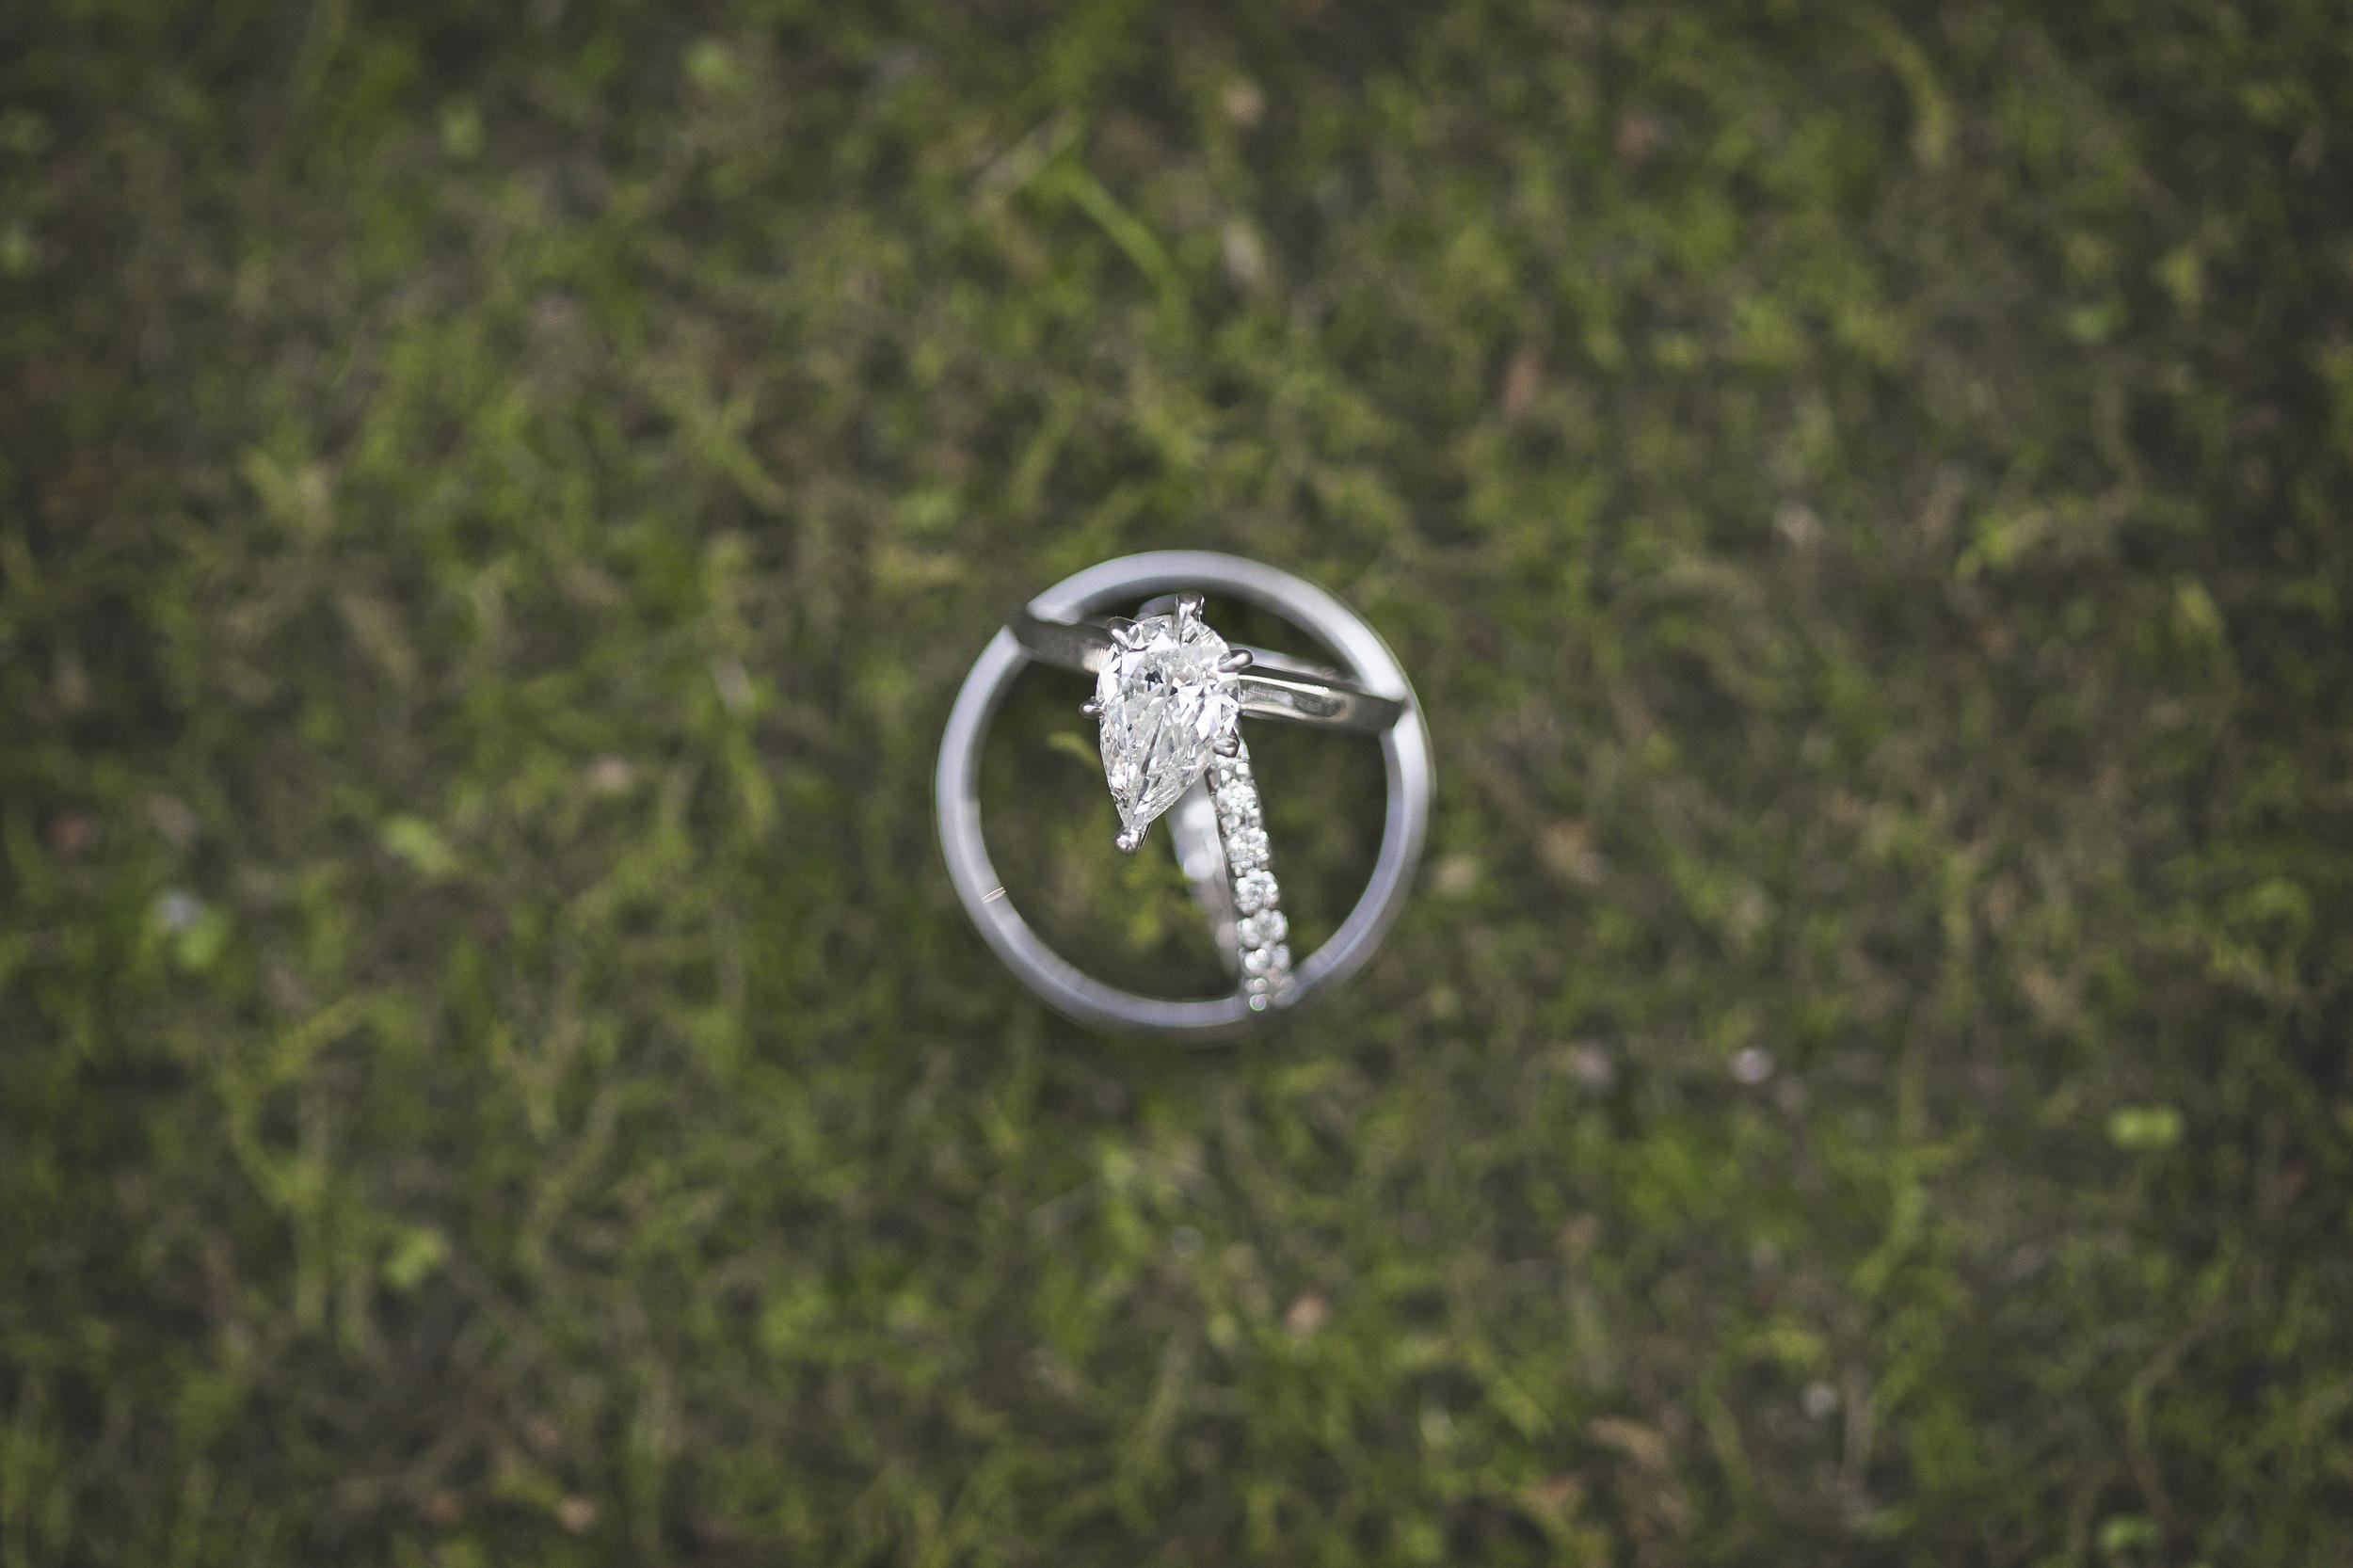 Raleigh Wedding Photographer | Lauryn Alisa Photography | www.laurynalisaphotography.com